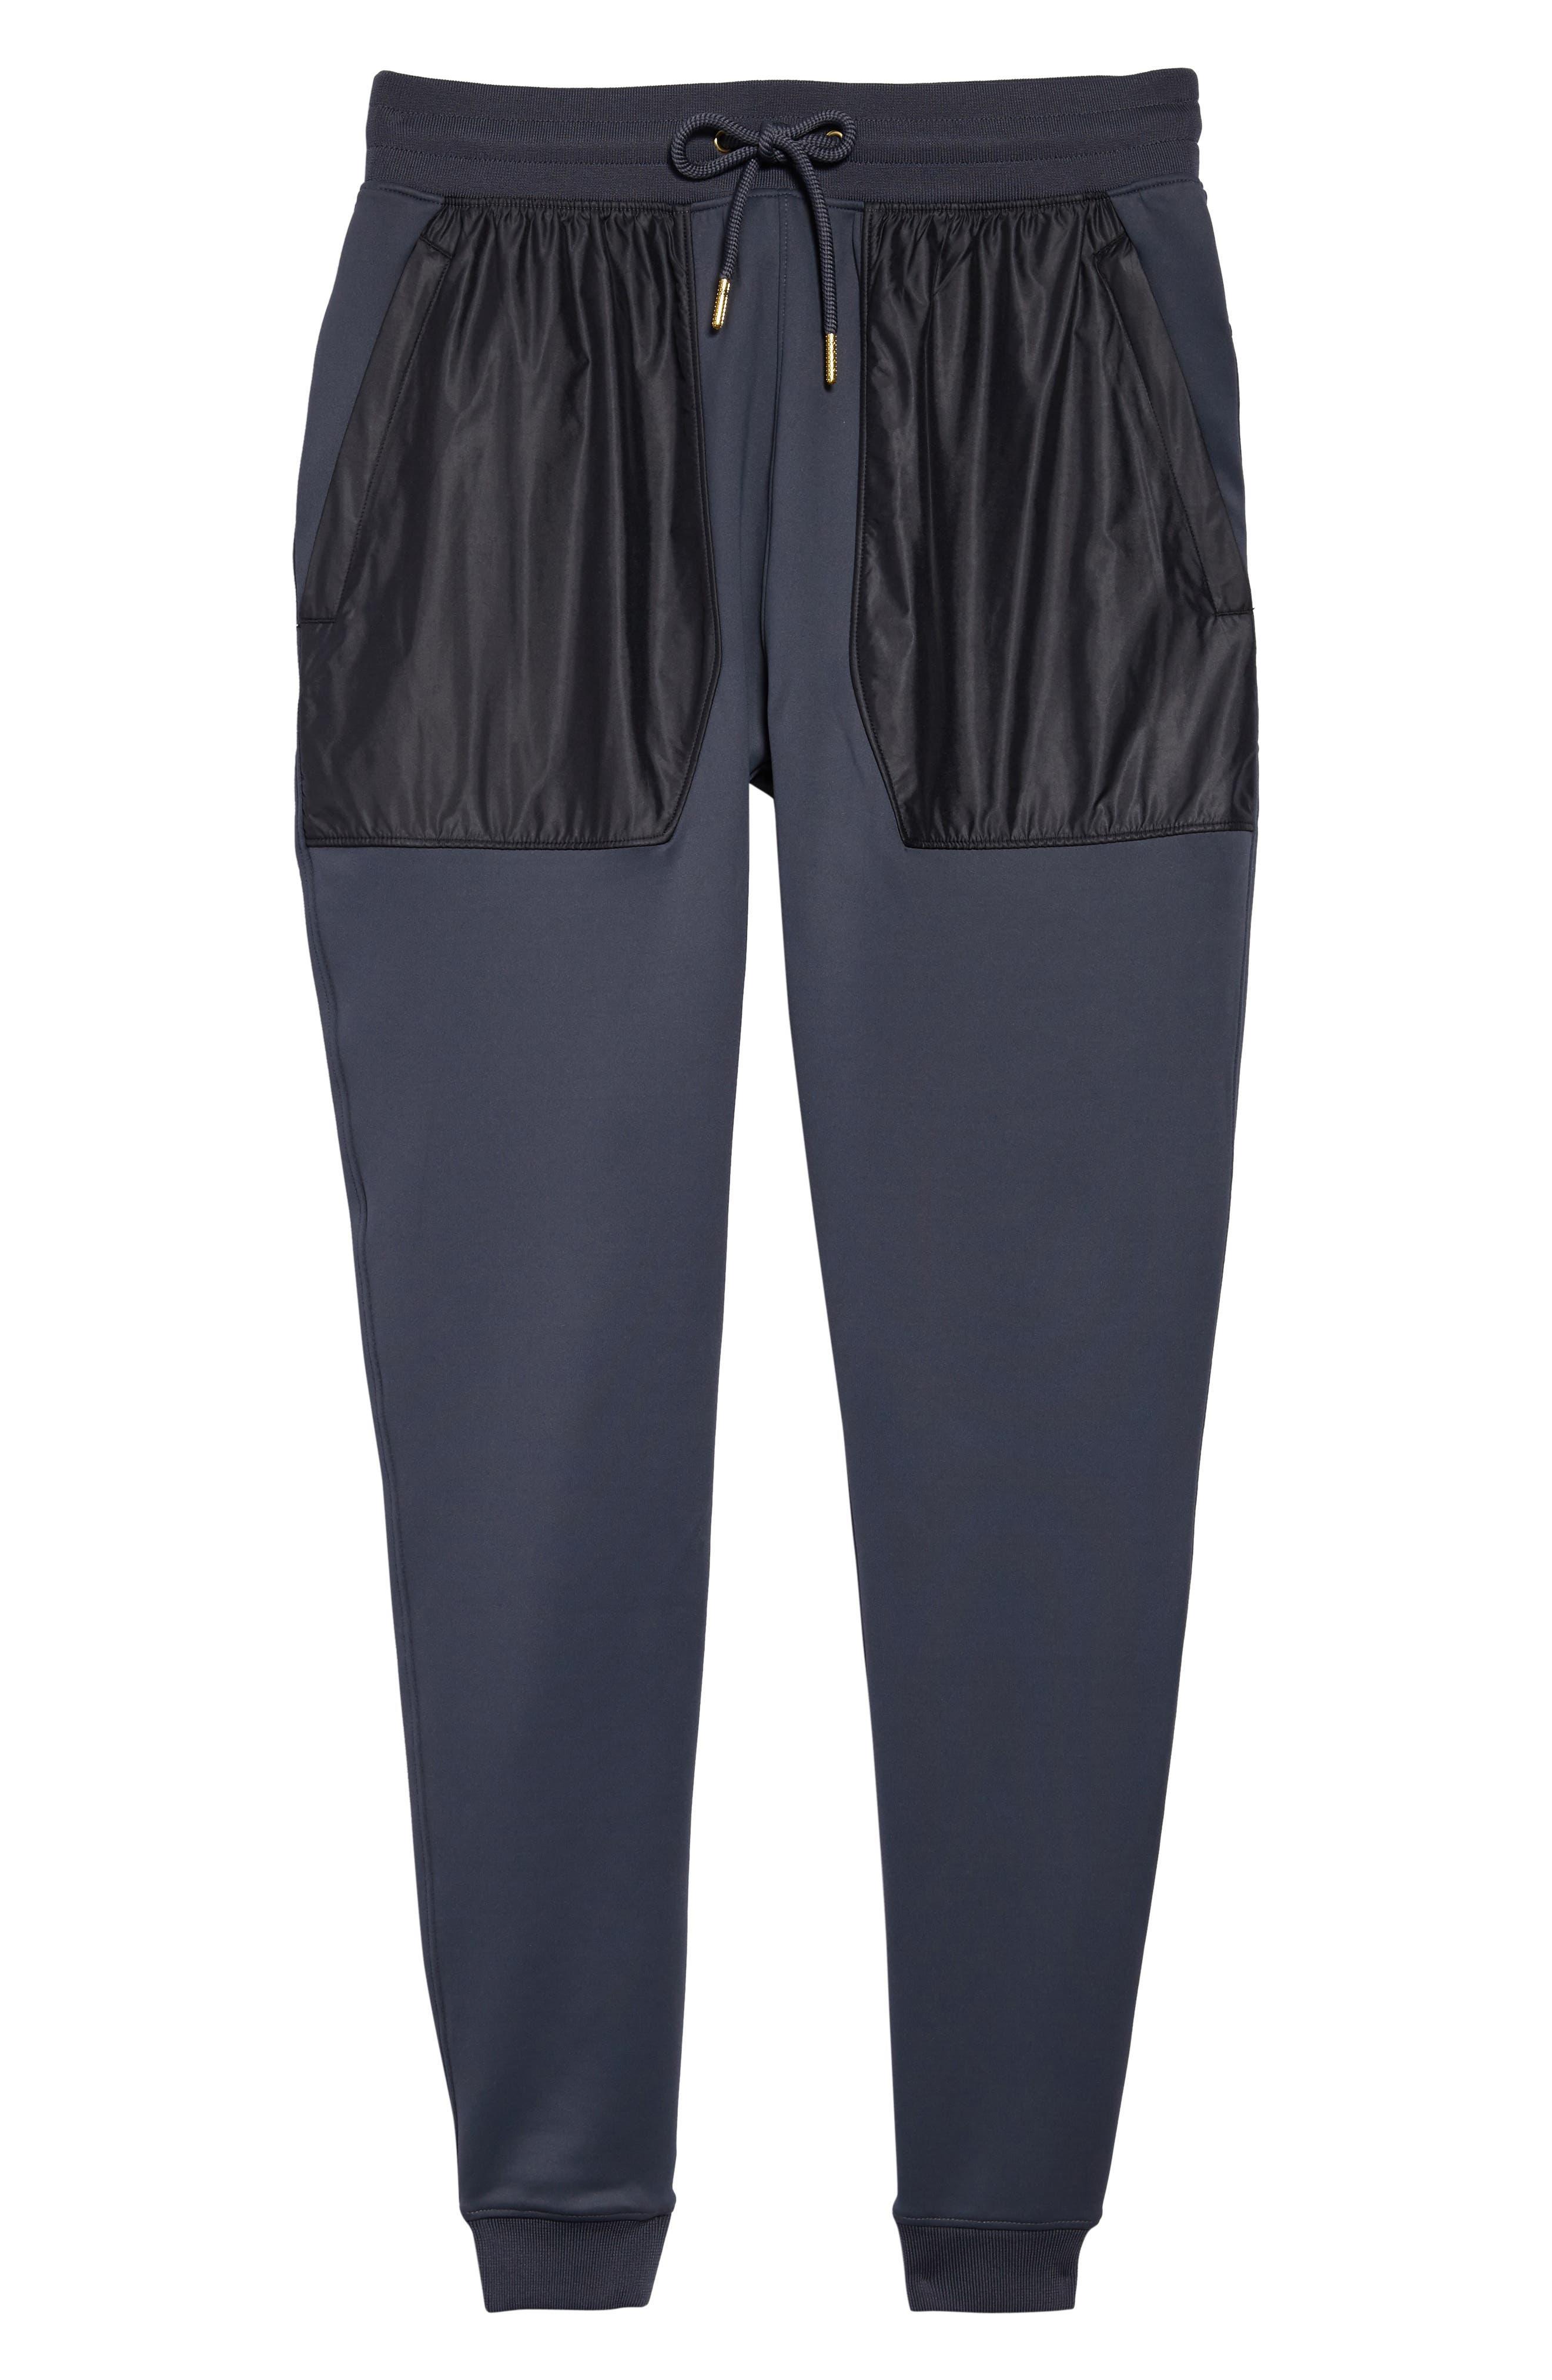 Utility Jogger Pants,                             Alternate thumbnail 6, color,                             Stealth Gray/ Black